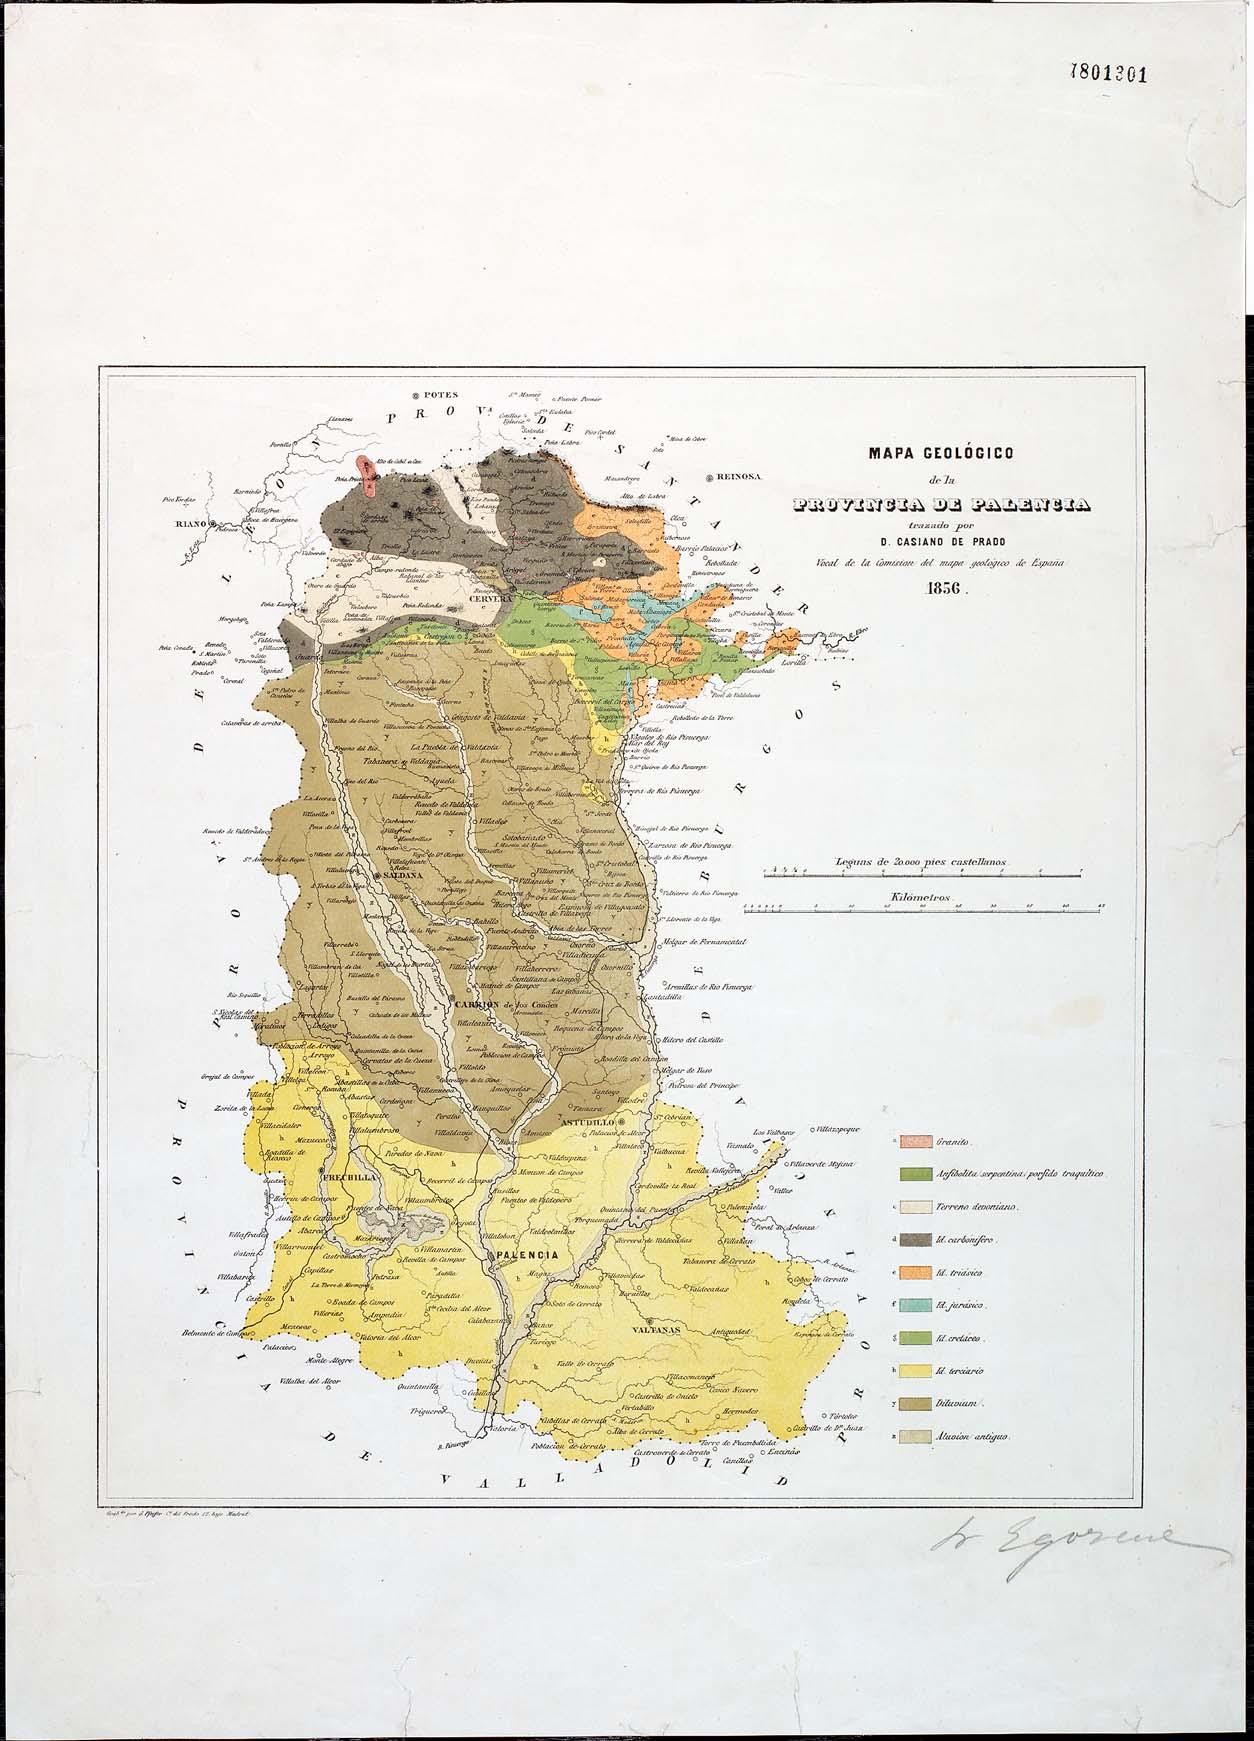 Mapa geológico de la provincia de Palencia 1856